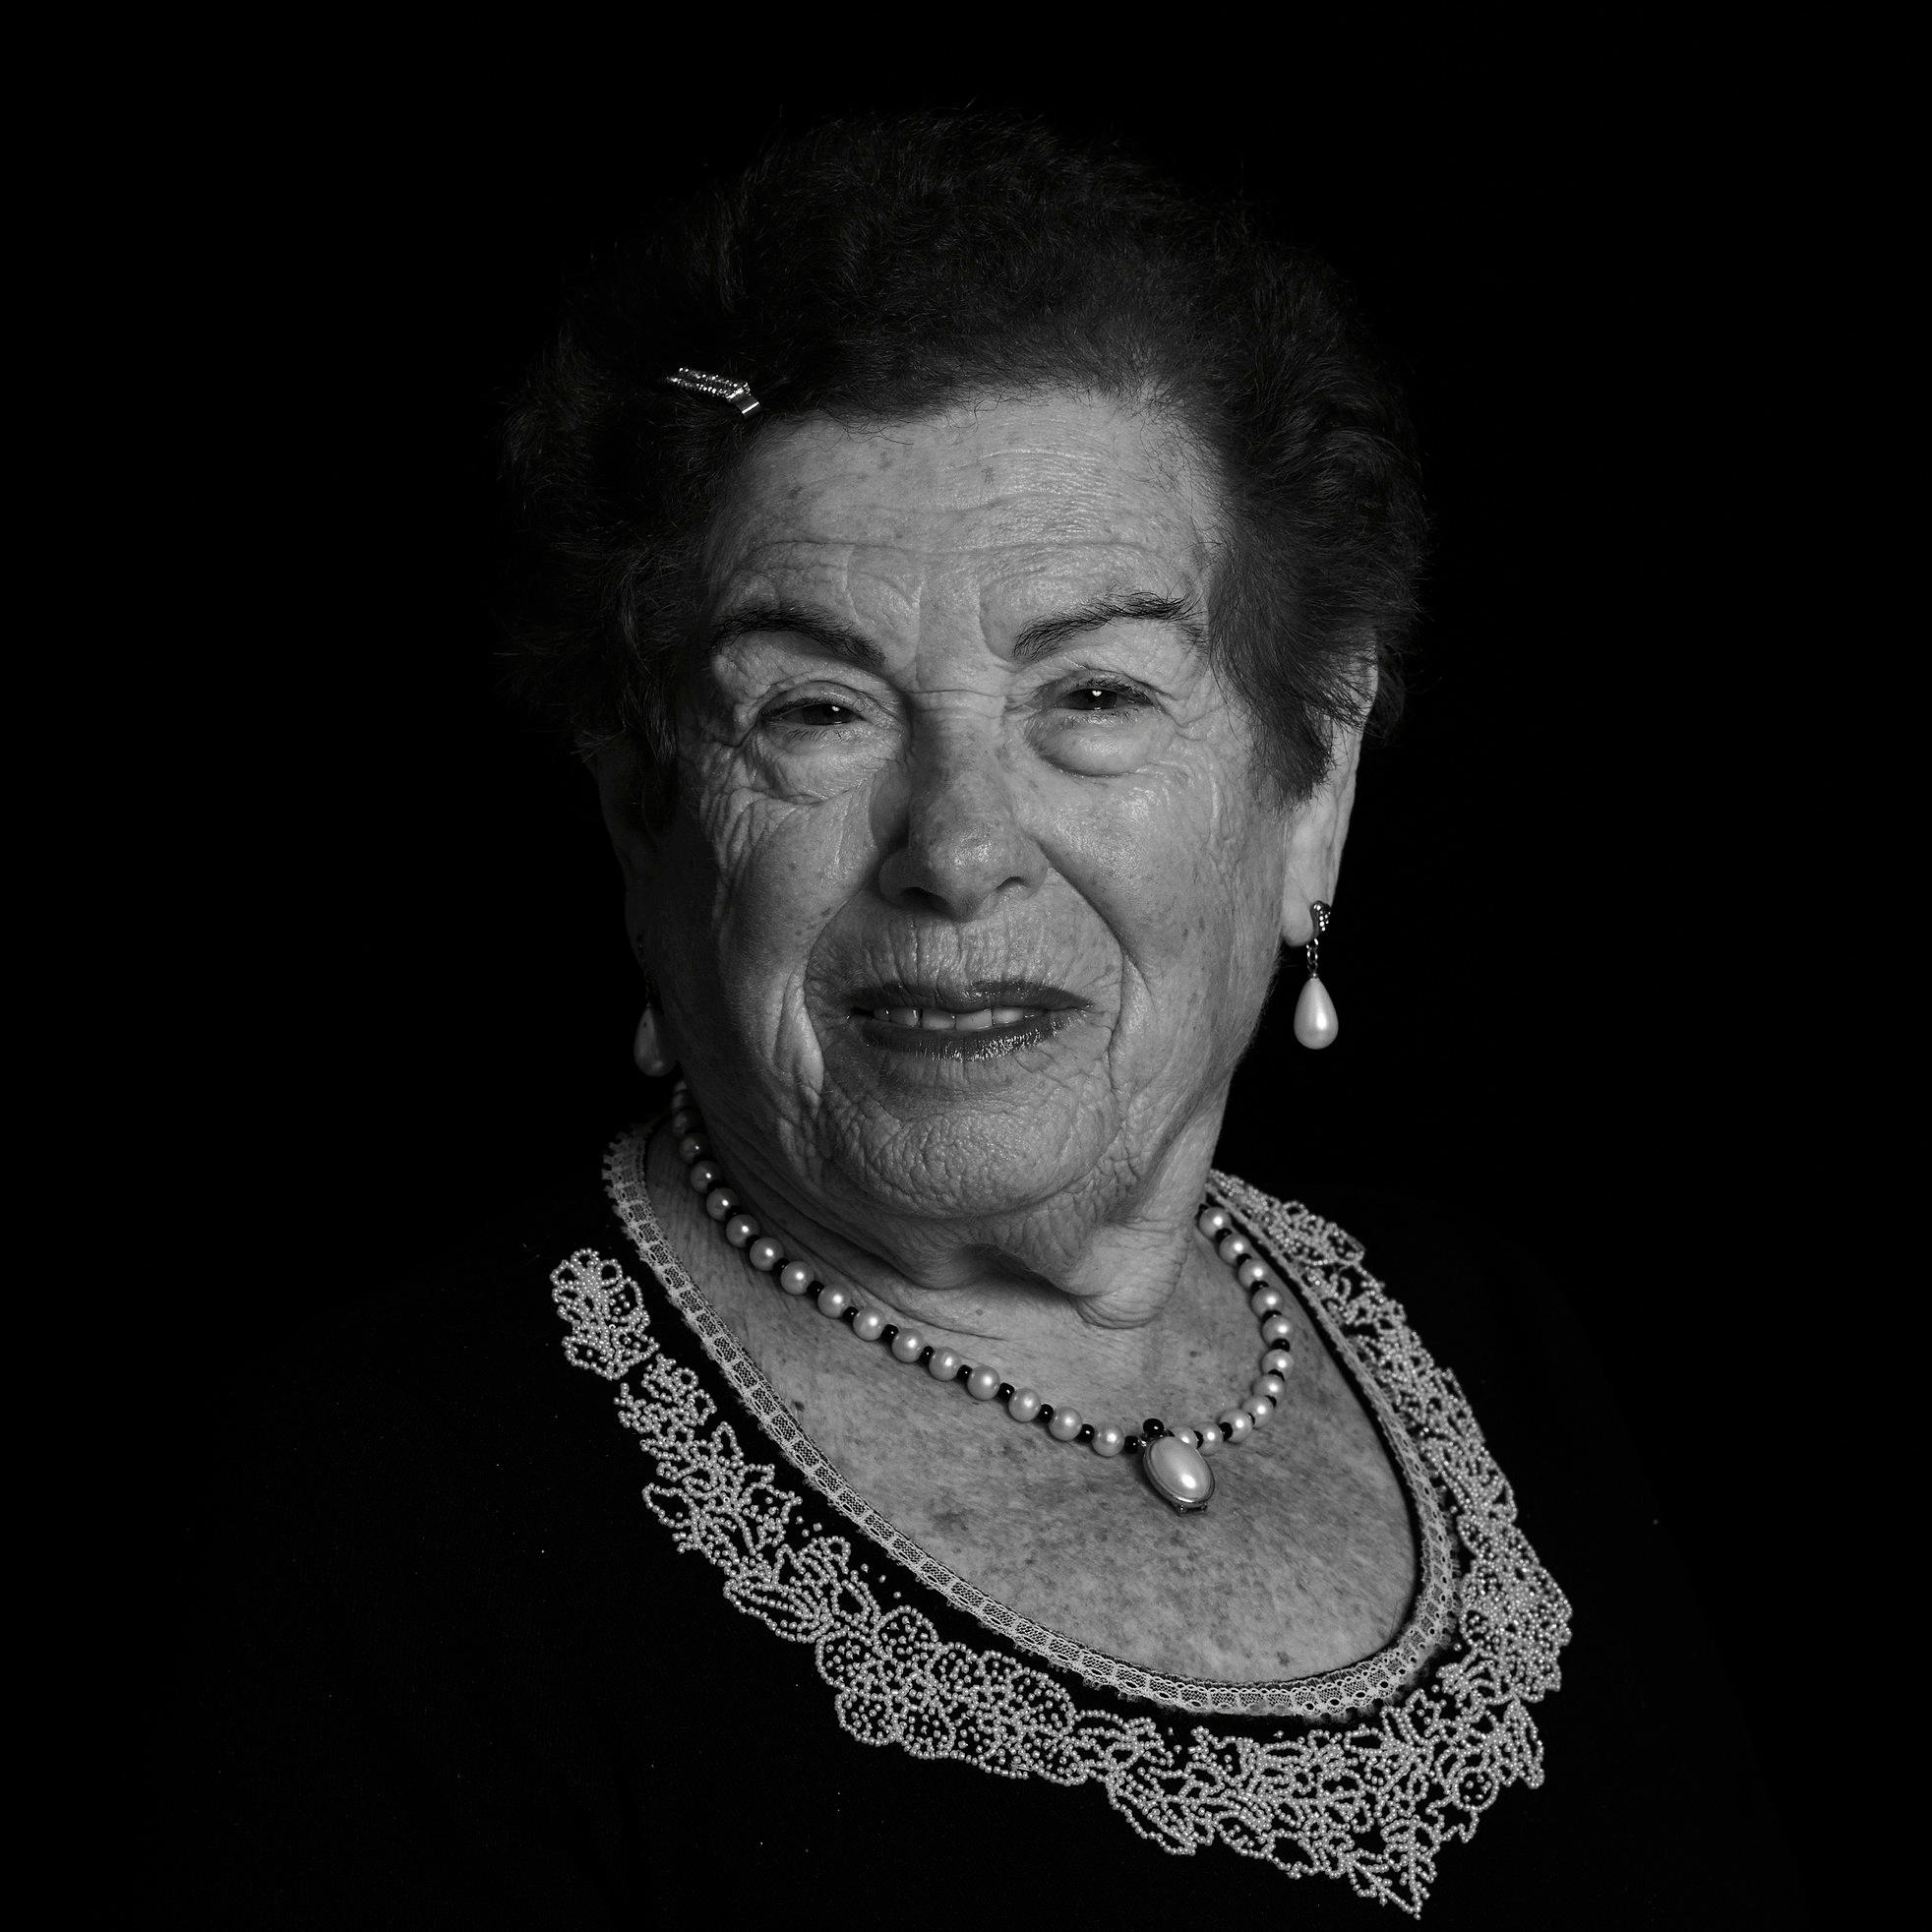 Irene Kurtz